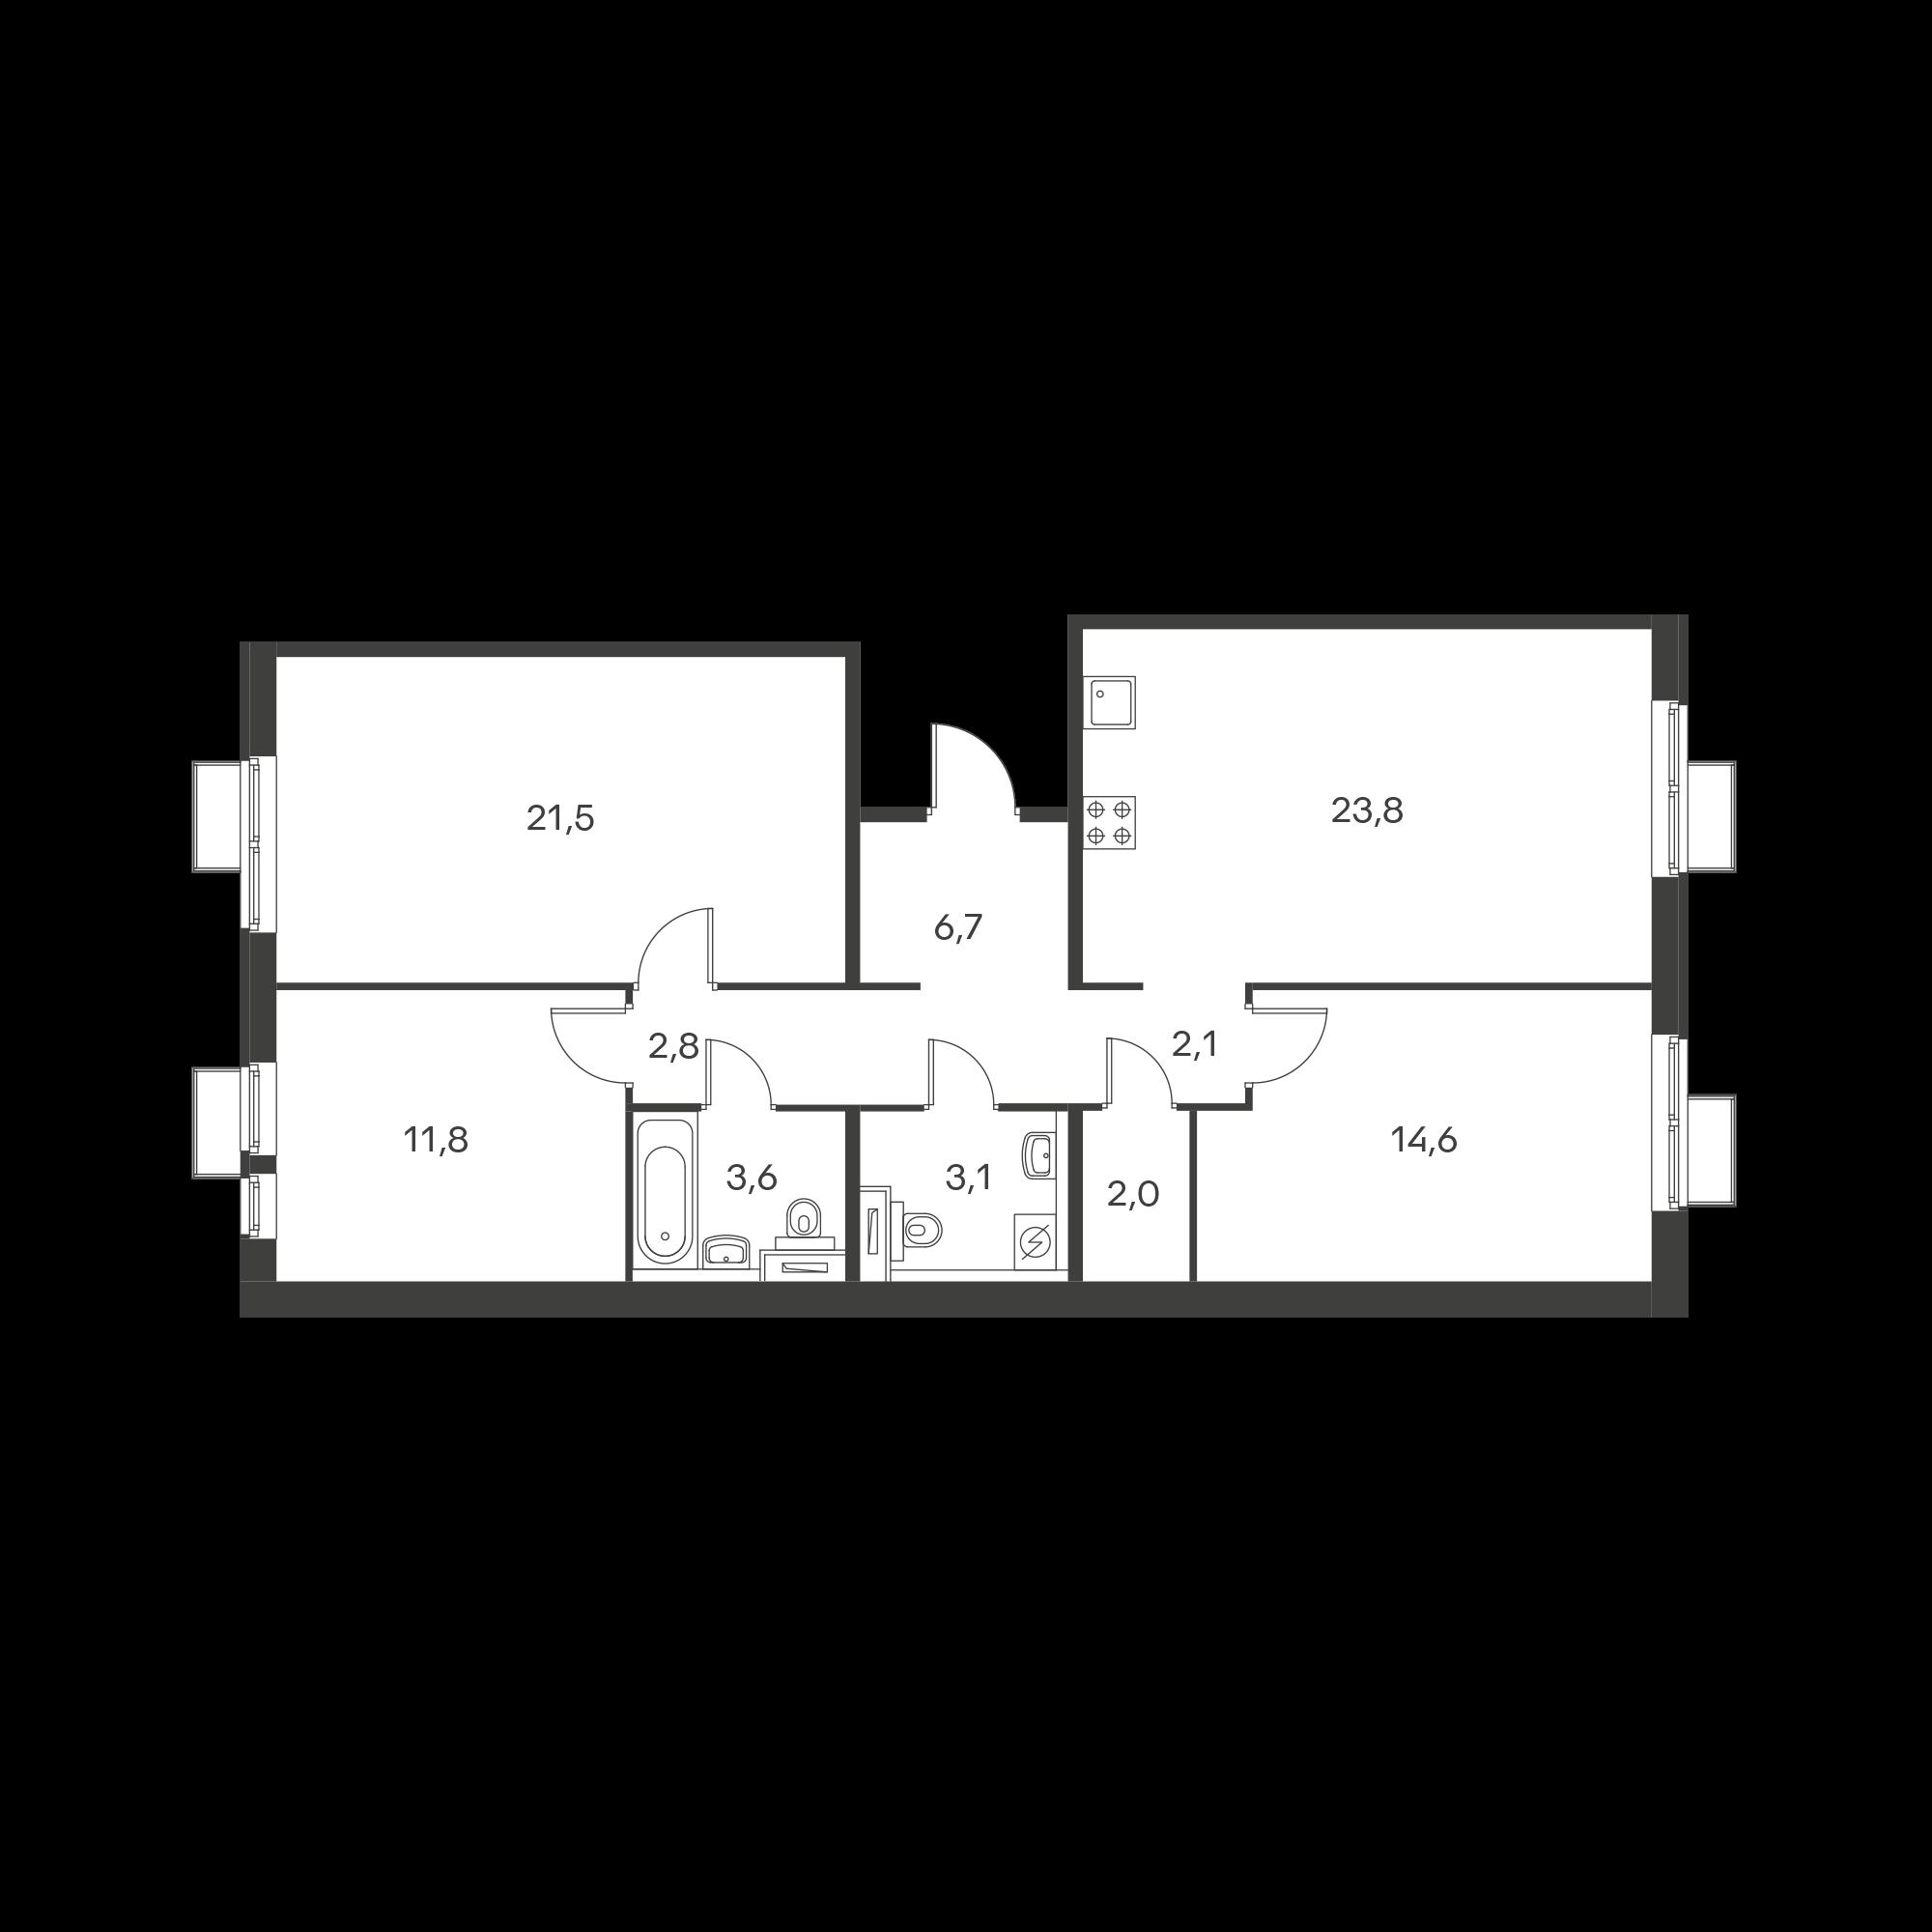 3EL5_7.2-1